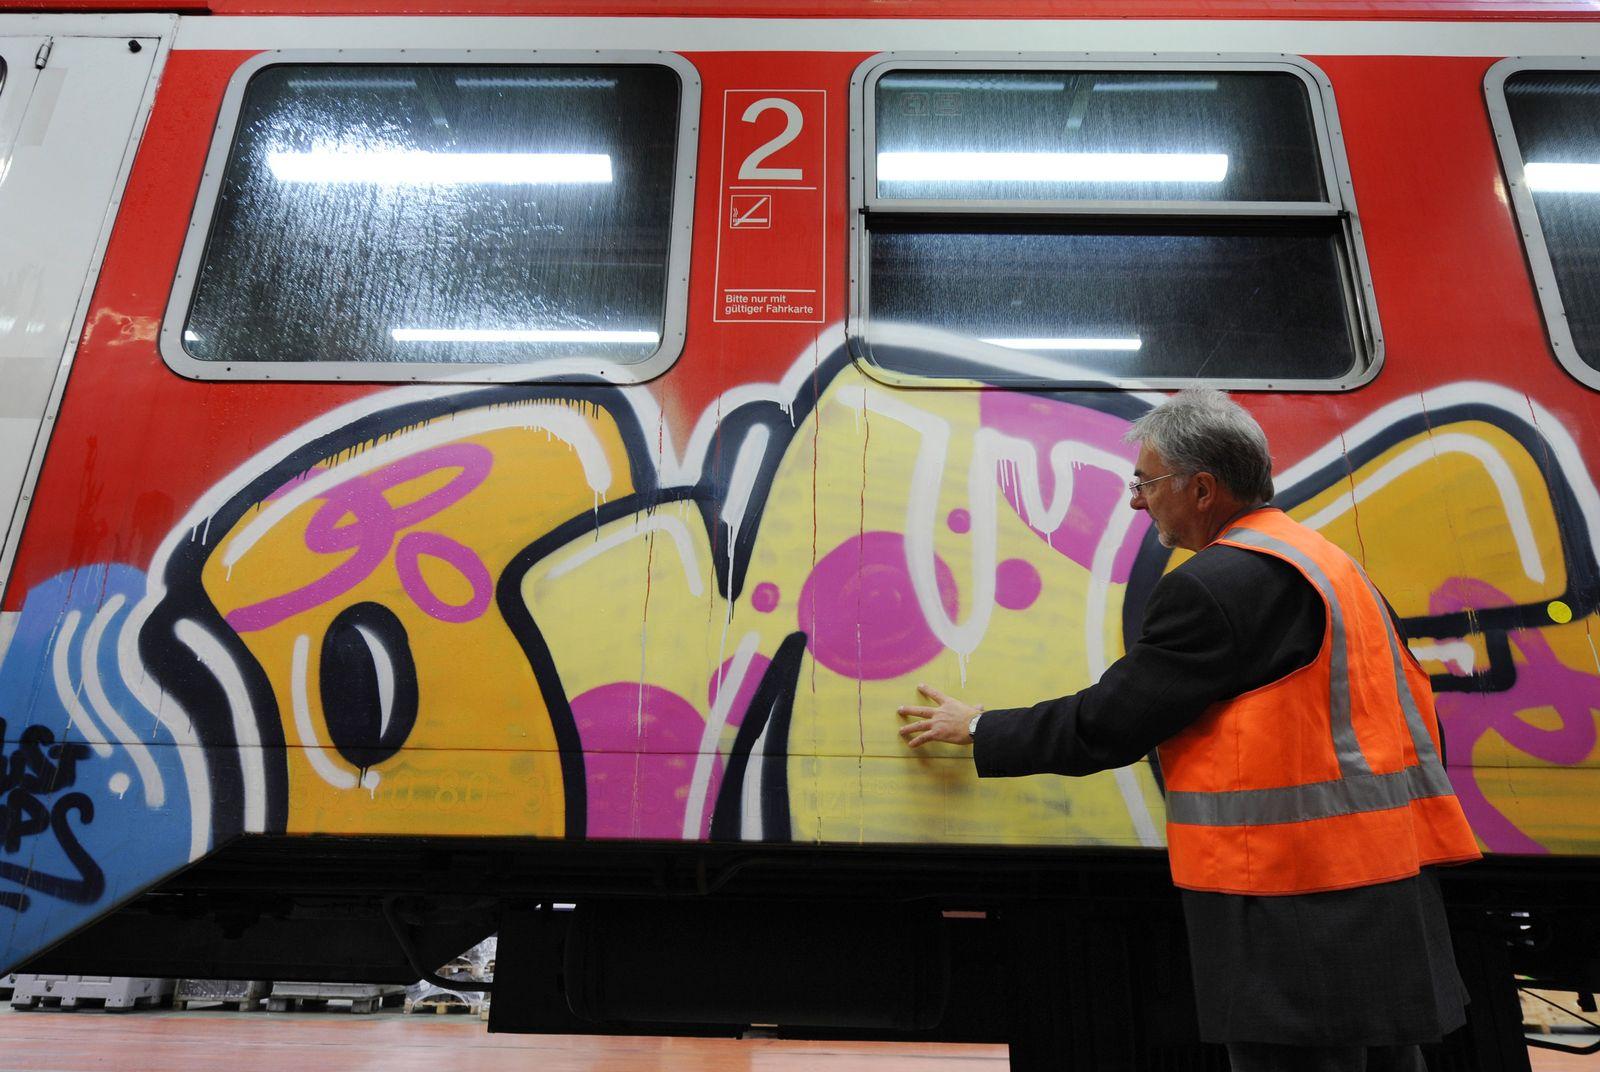 Deutsche Bahn / Graffiti